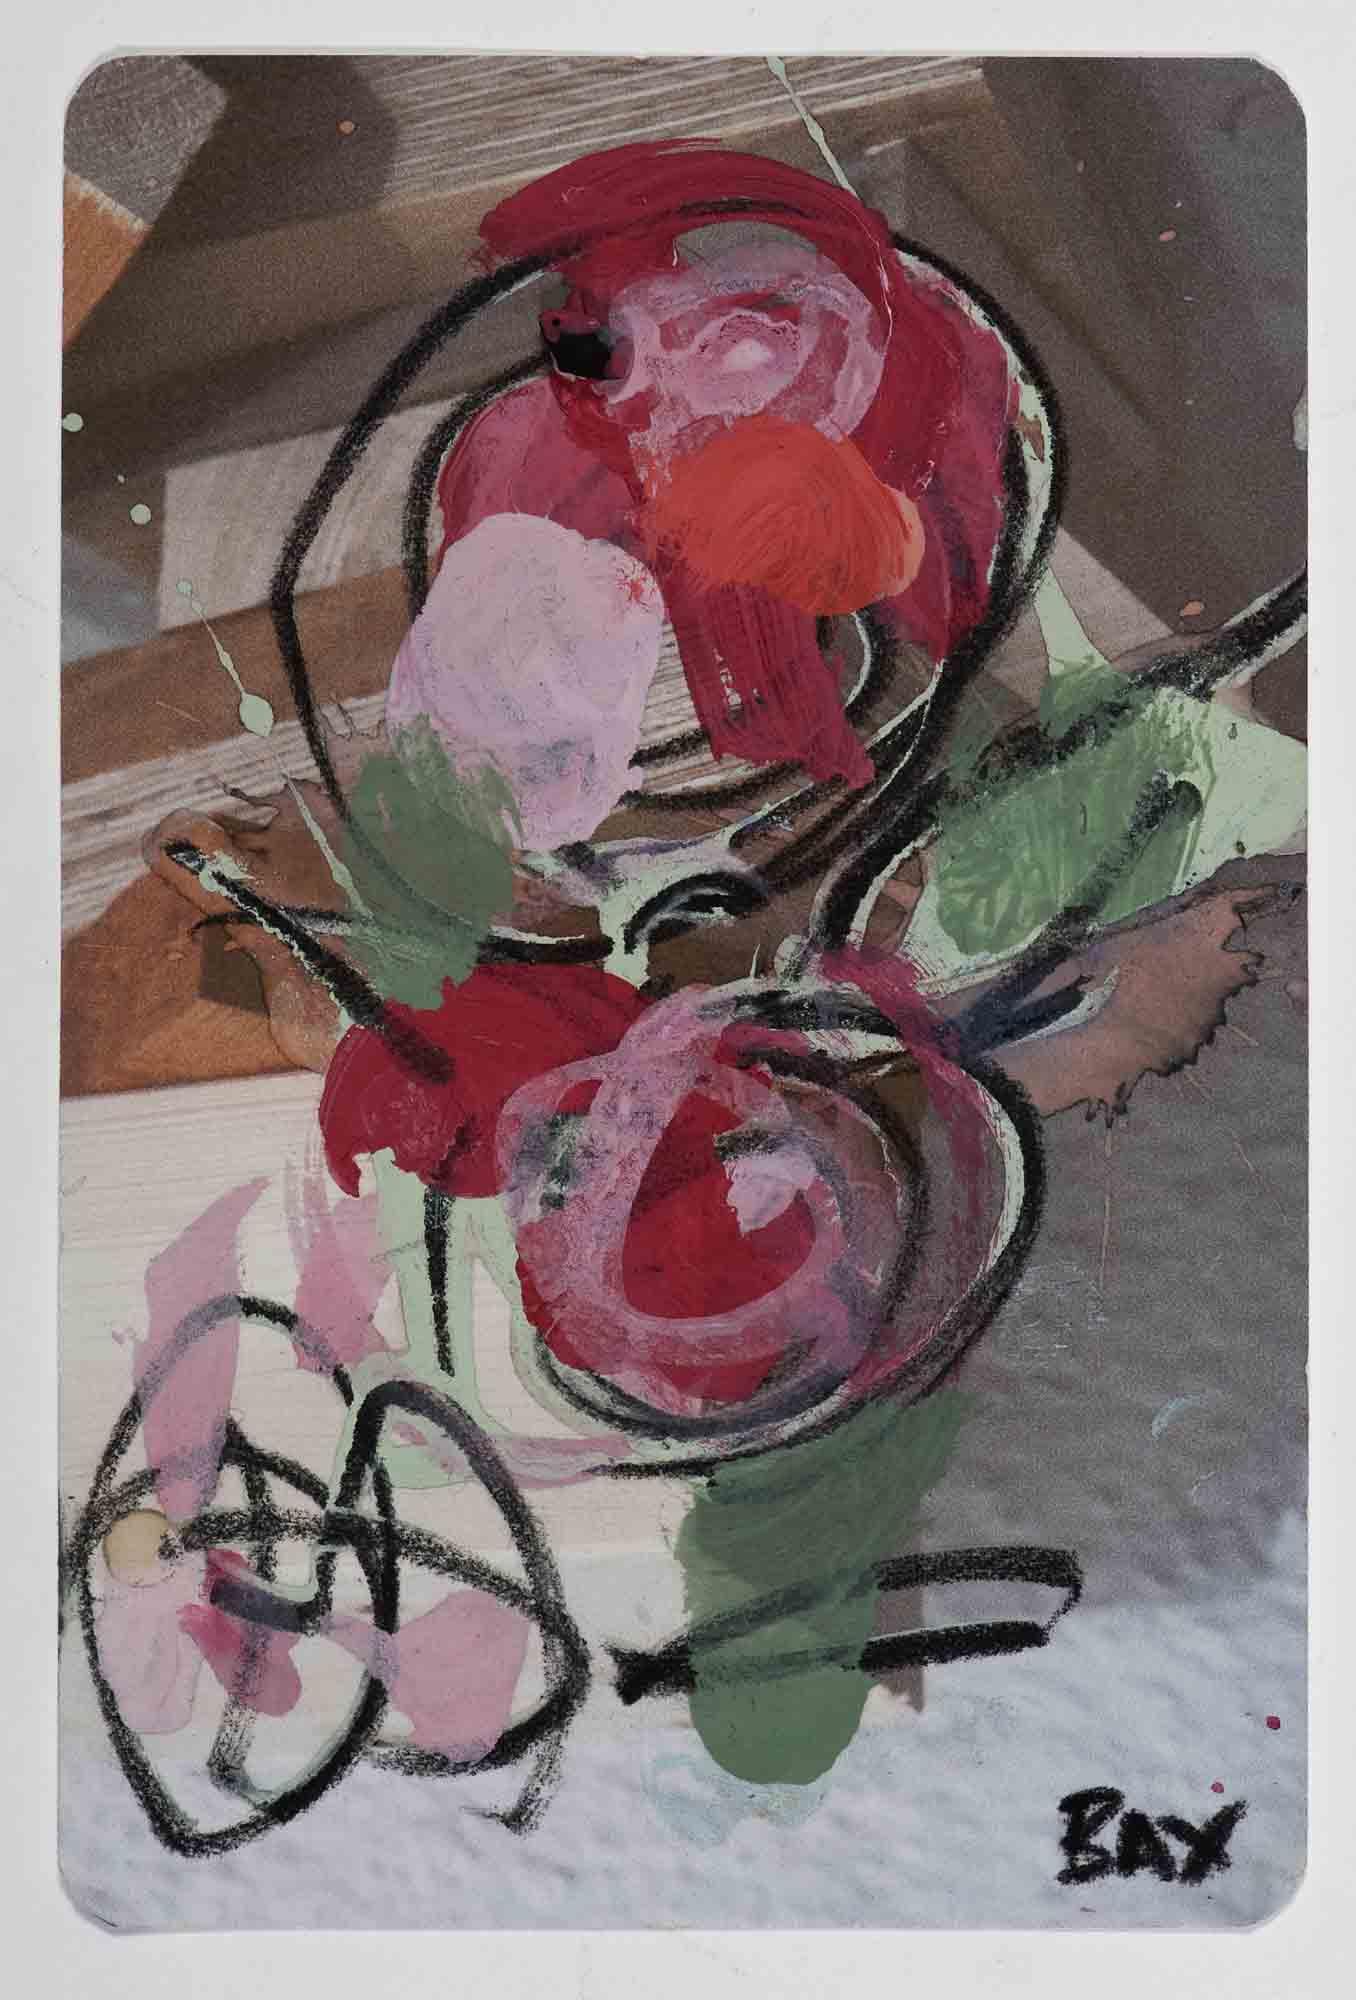 Matthew Bax,  Sample Cosy Escape , 2012, acrylic, charcoal, pencil, wax crayon on paper, 15 x 10cm